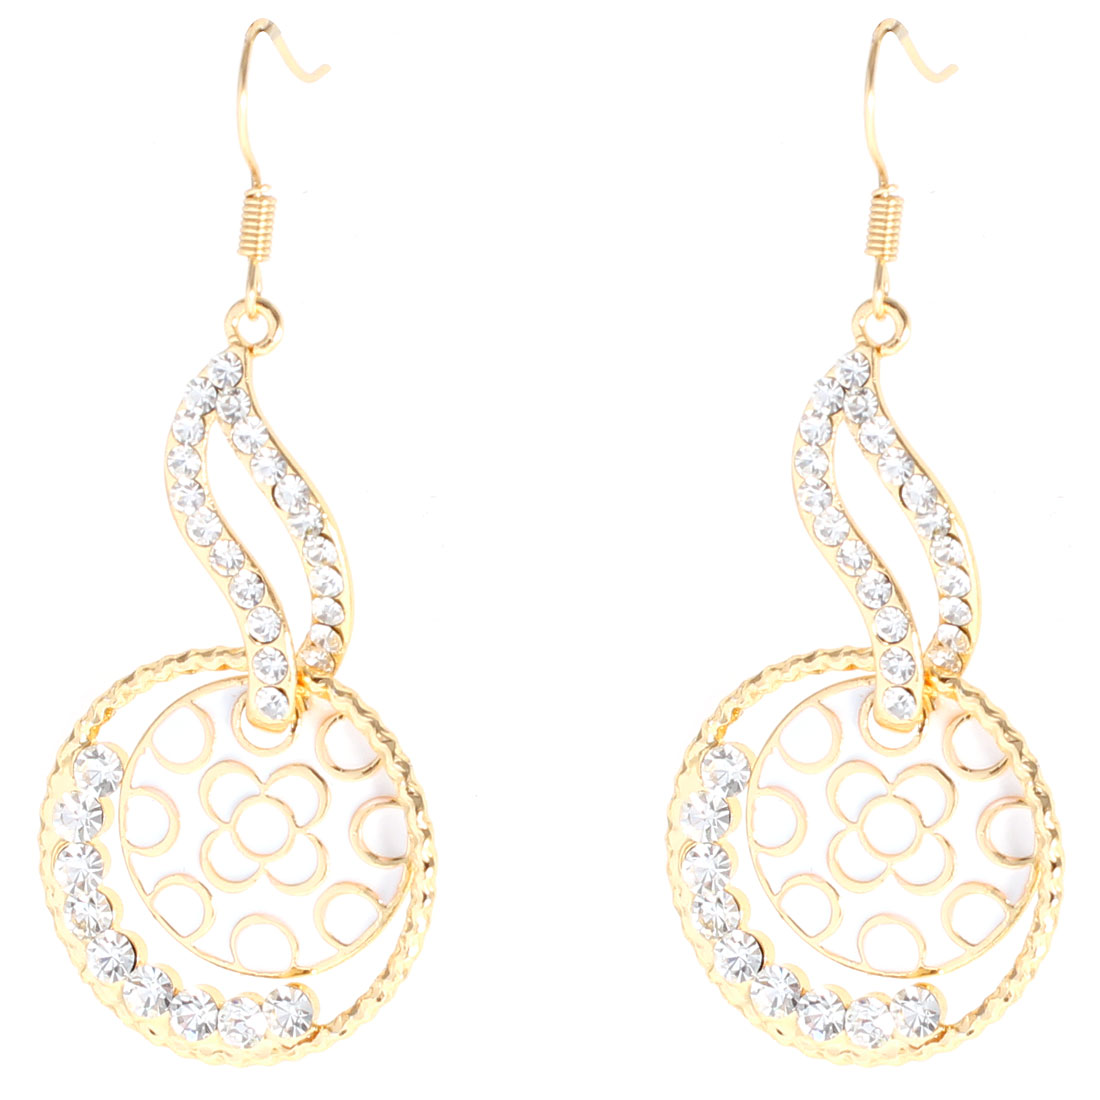 Rhinestone Decorated Circular Intersected Leaf Shaped Earrings